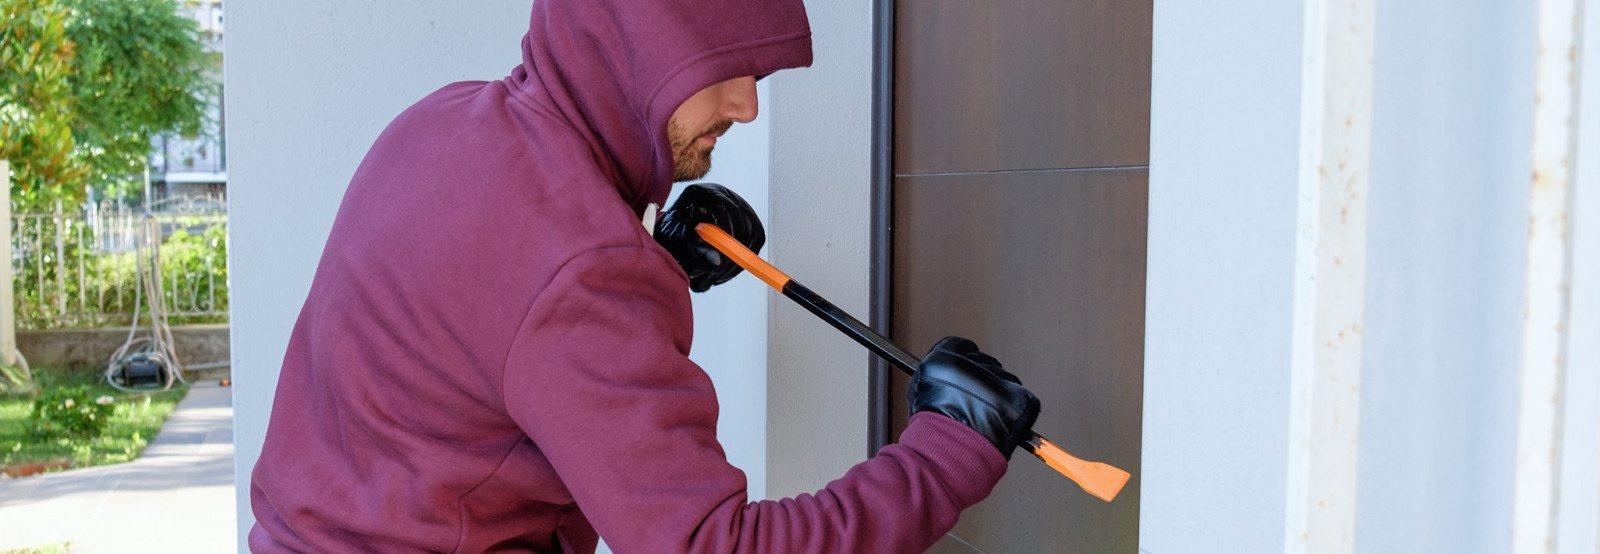 puertas antiokupa ladron hori - Instalacion Puerta Antiokupa Puerta Antiocupa Precio Puertas de Seguridad